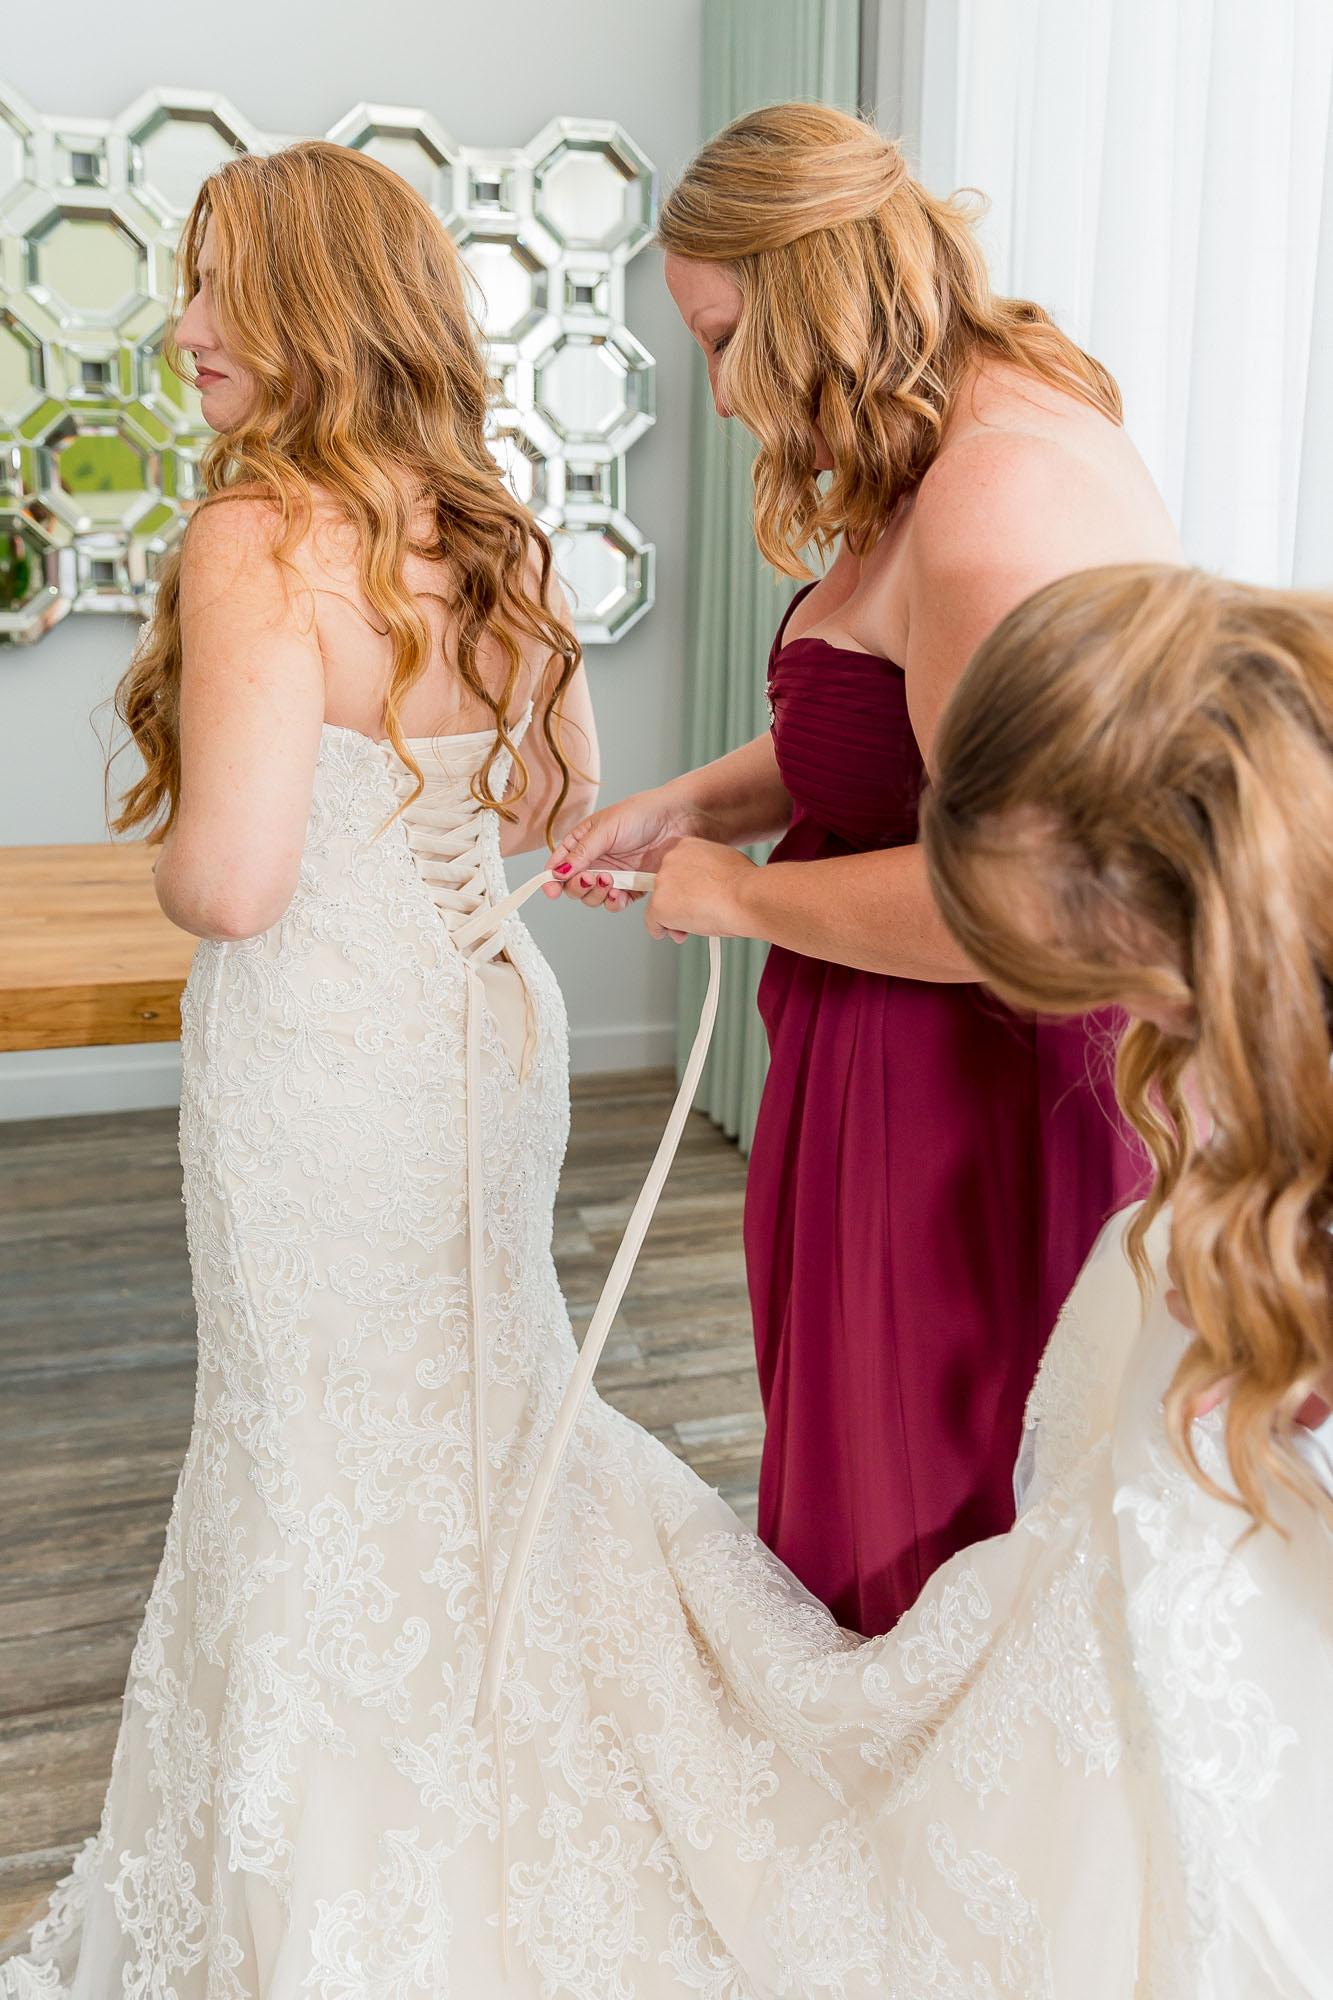 Heather_Pat_San_Marcos_Lakehouse_Wedding_107.jpg